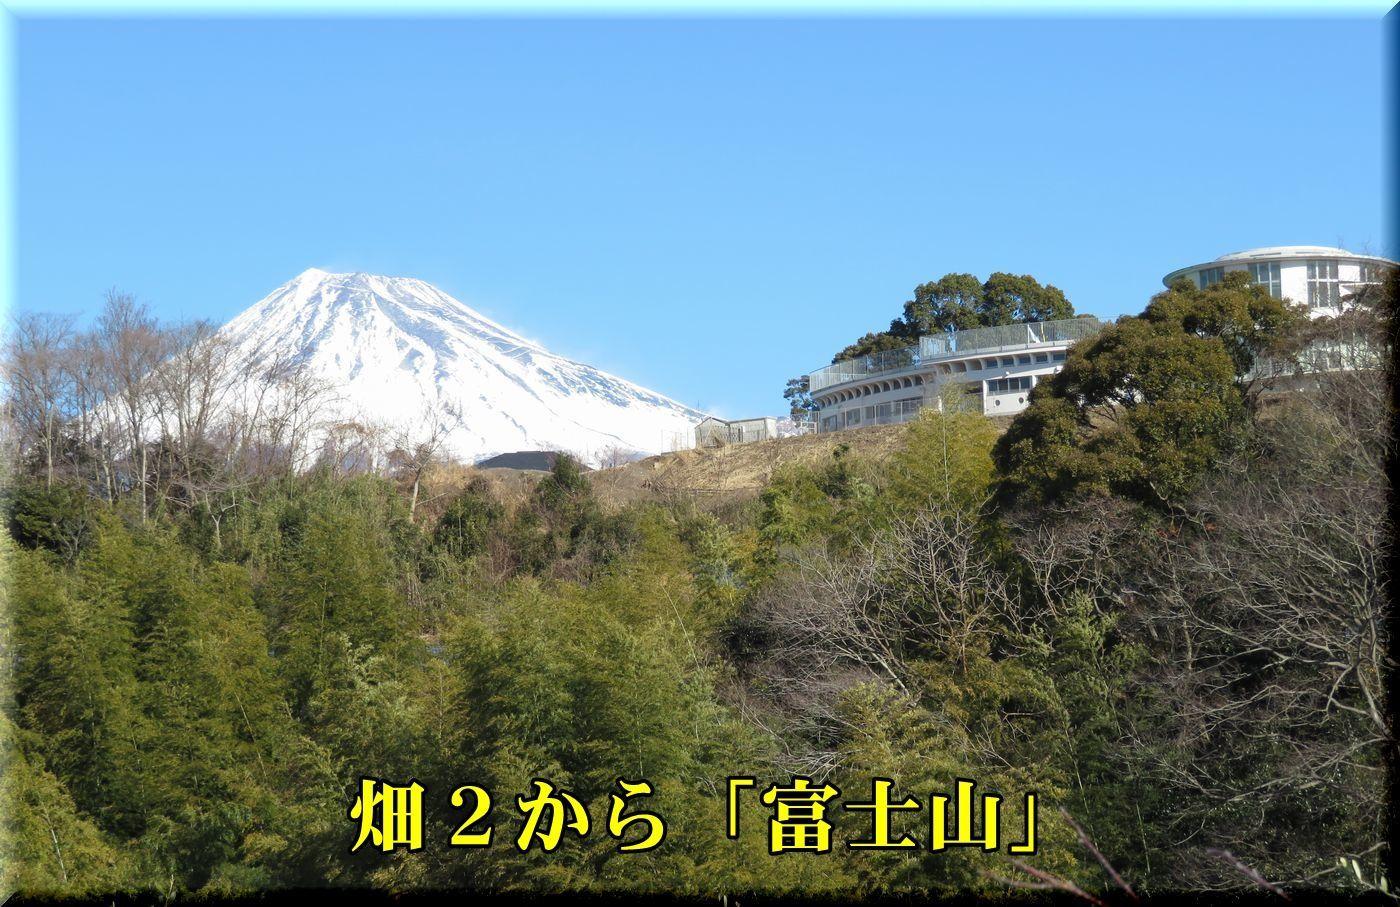 1H2fuji180207_044.jpg